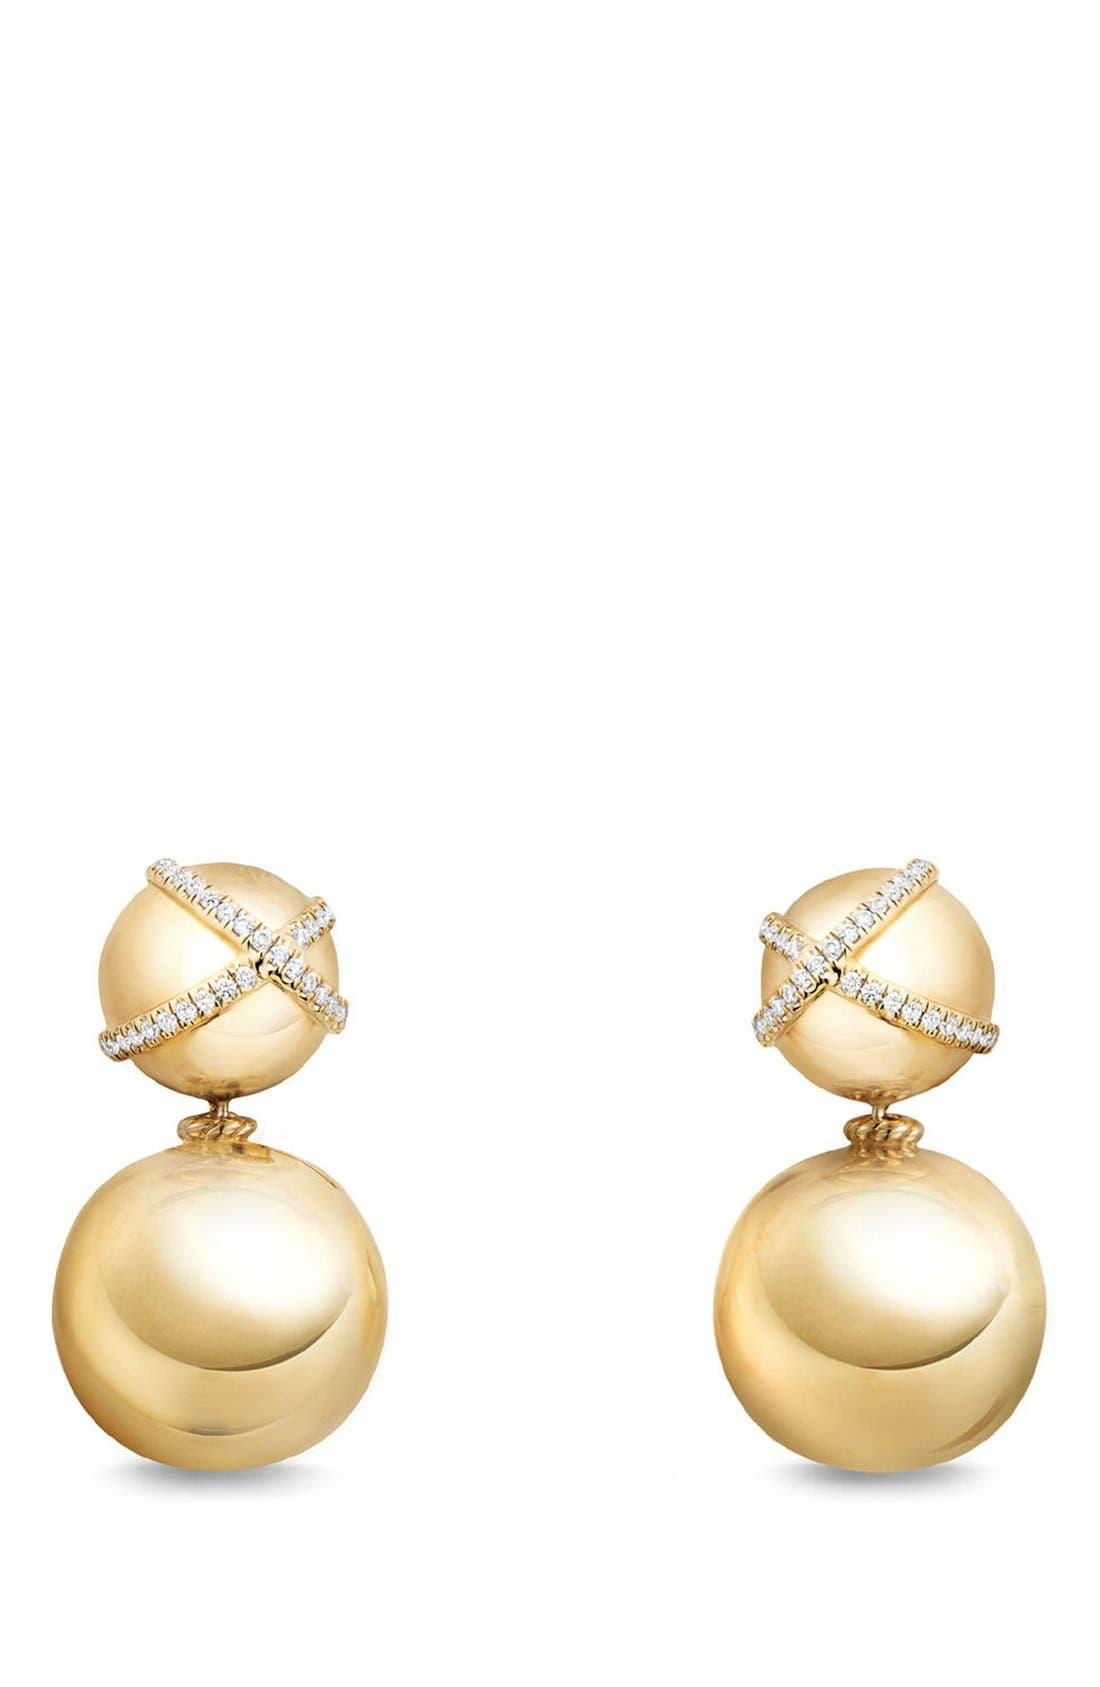 Main Image - David Yurman 'Solari' Pavé Wrap Double Drop Earrings with Diamonds in 18K Gold